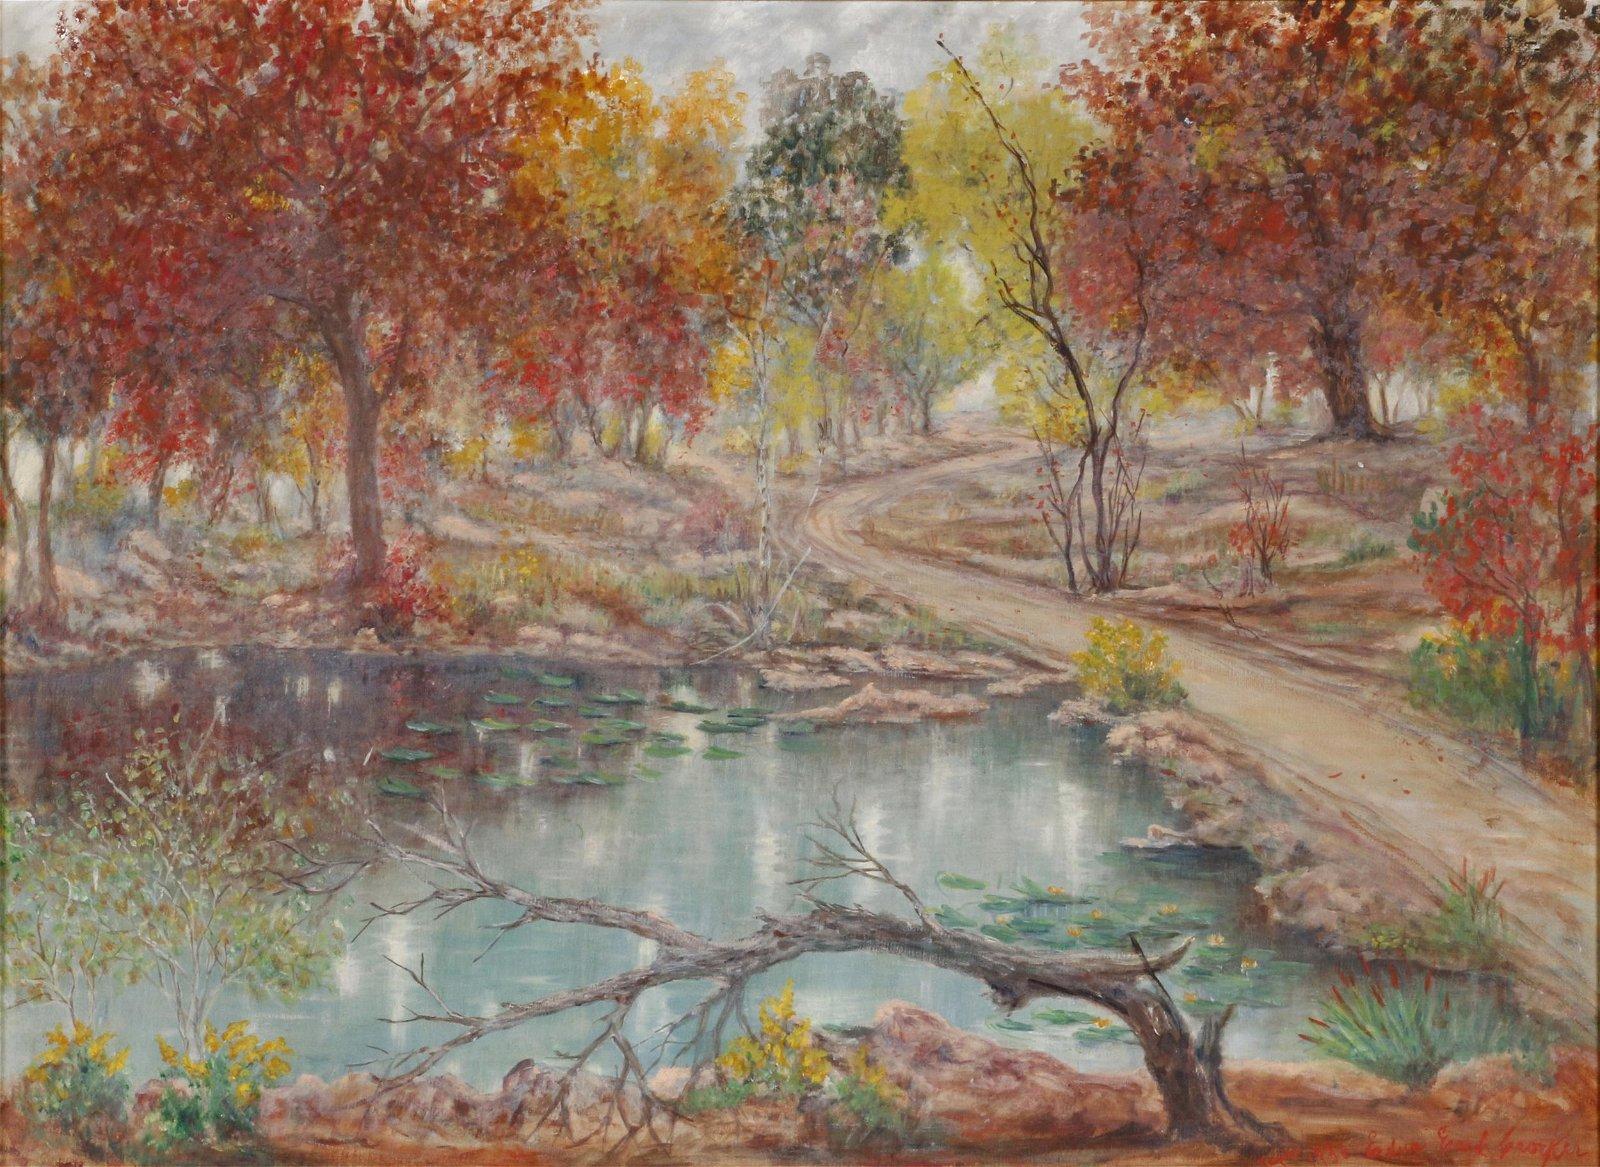 Edna Earl Crocker (1877-1942) Painting